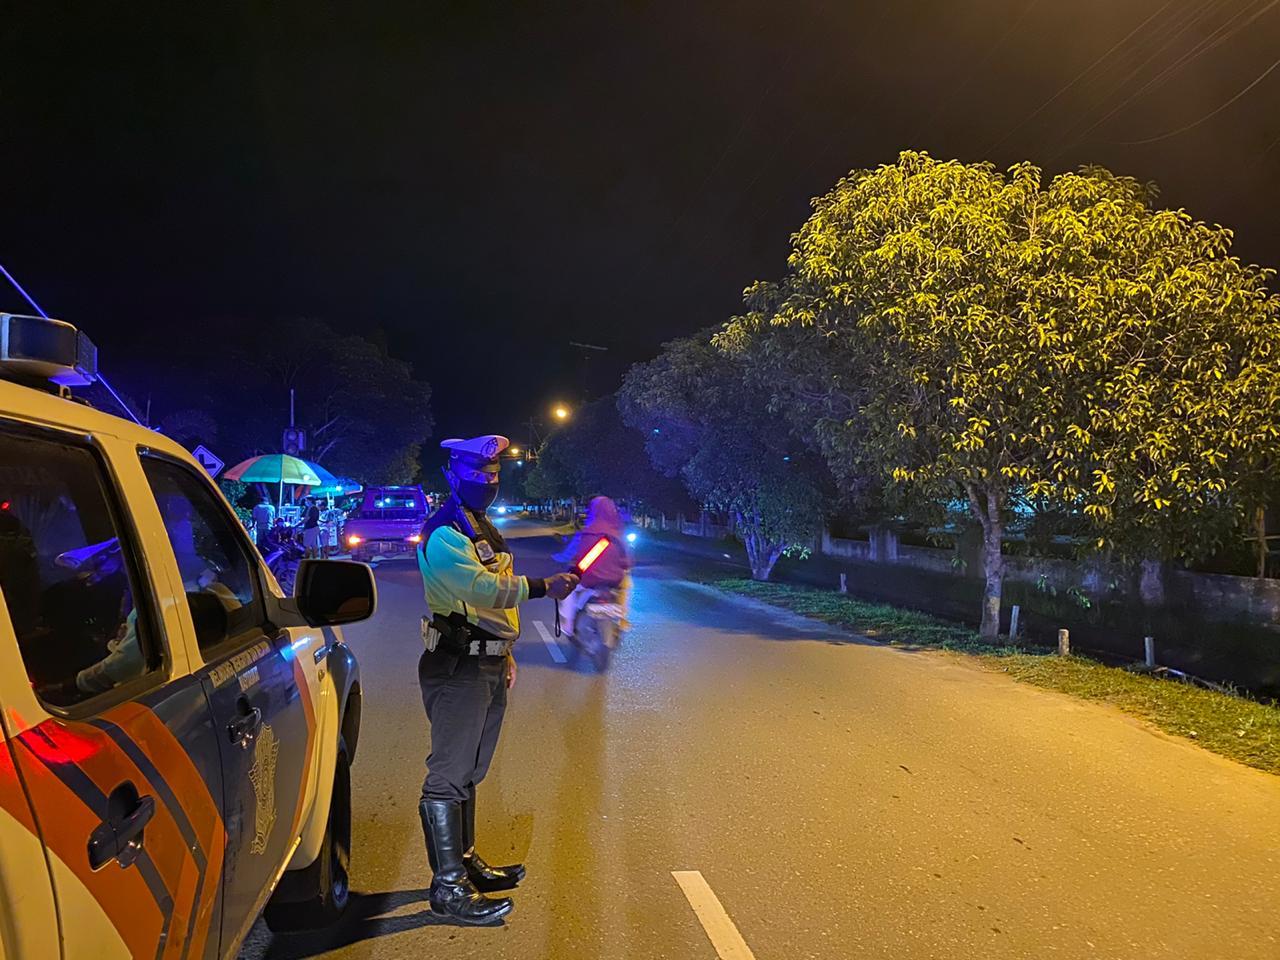 Cegah Aksi Ugal-ugalan di Jalan, Satlantas Ketapang Laksanakan Patroli Malam Hari